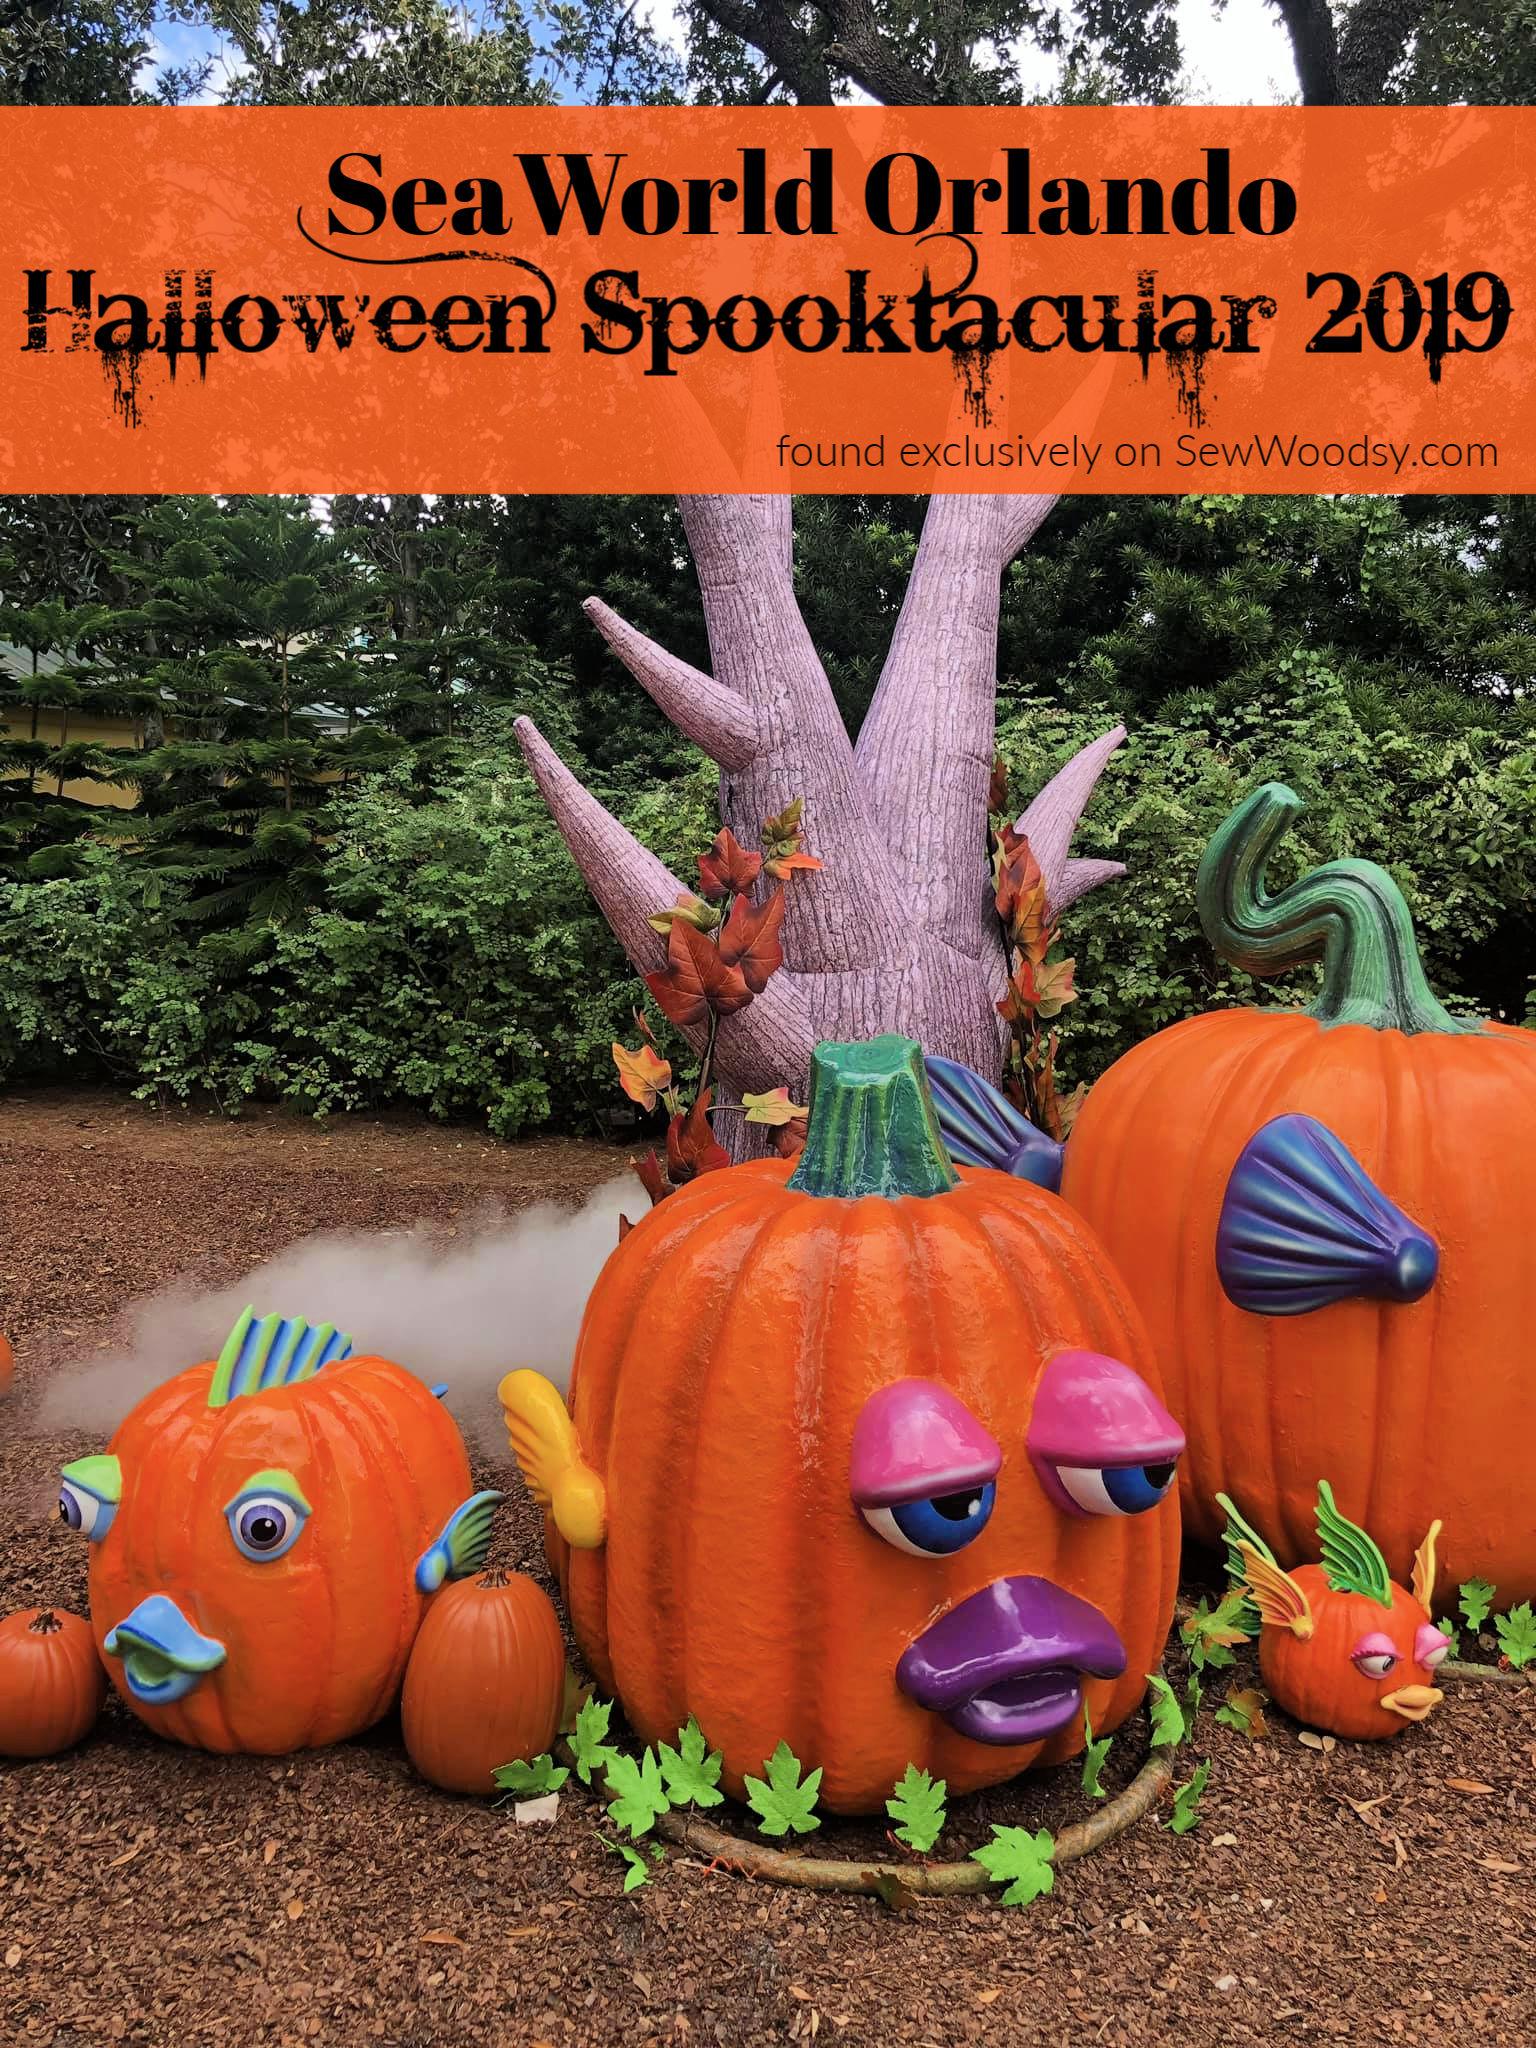 SeaWorld Orlando Halloween Spooktacular 2019